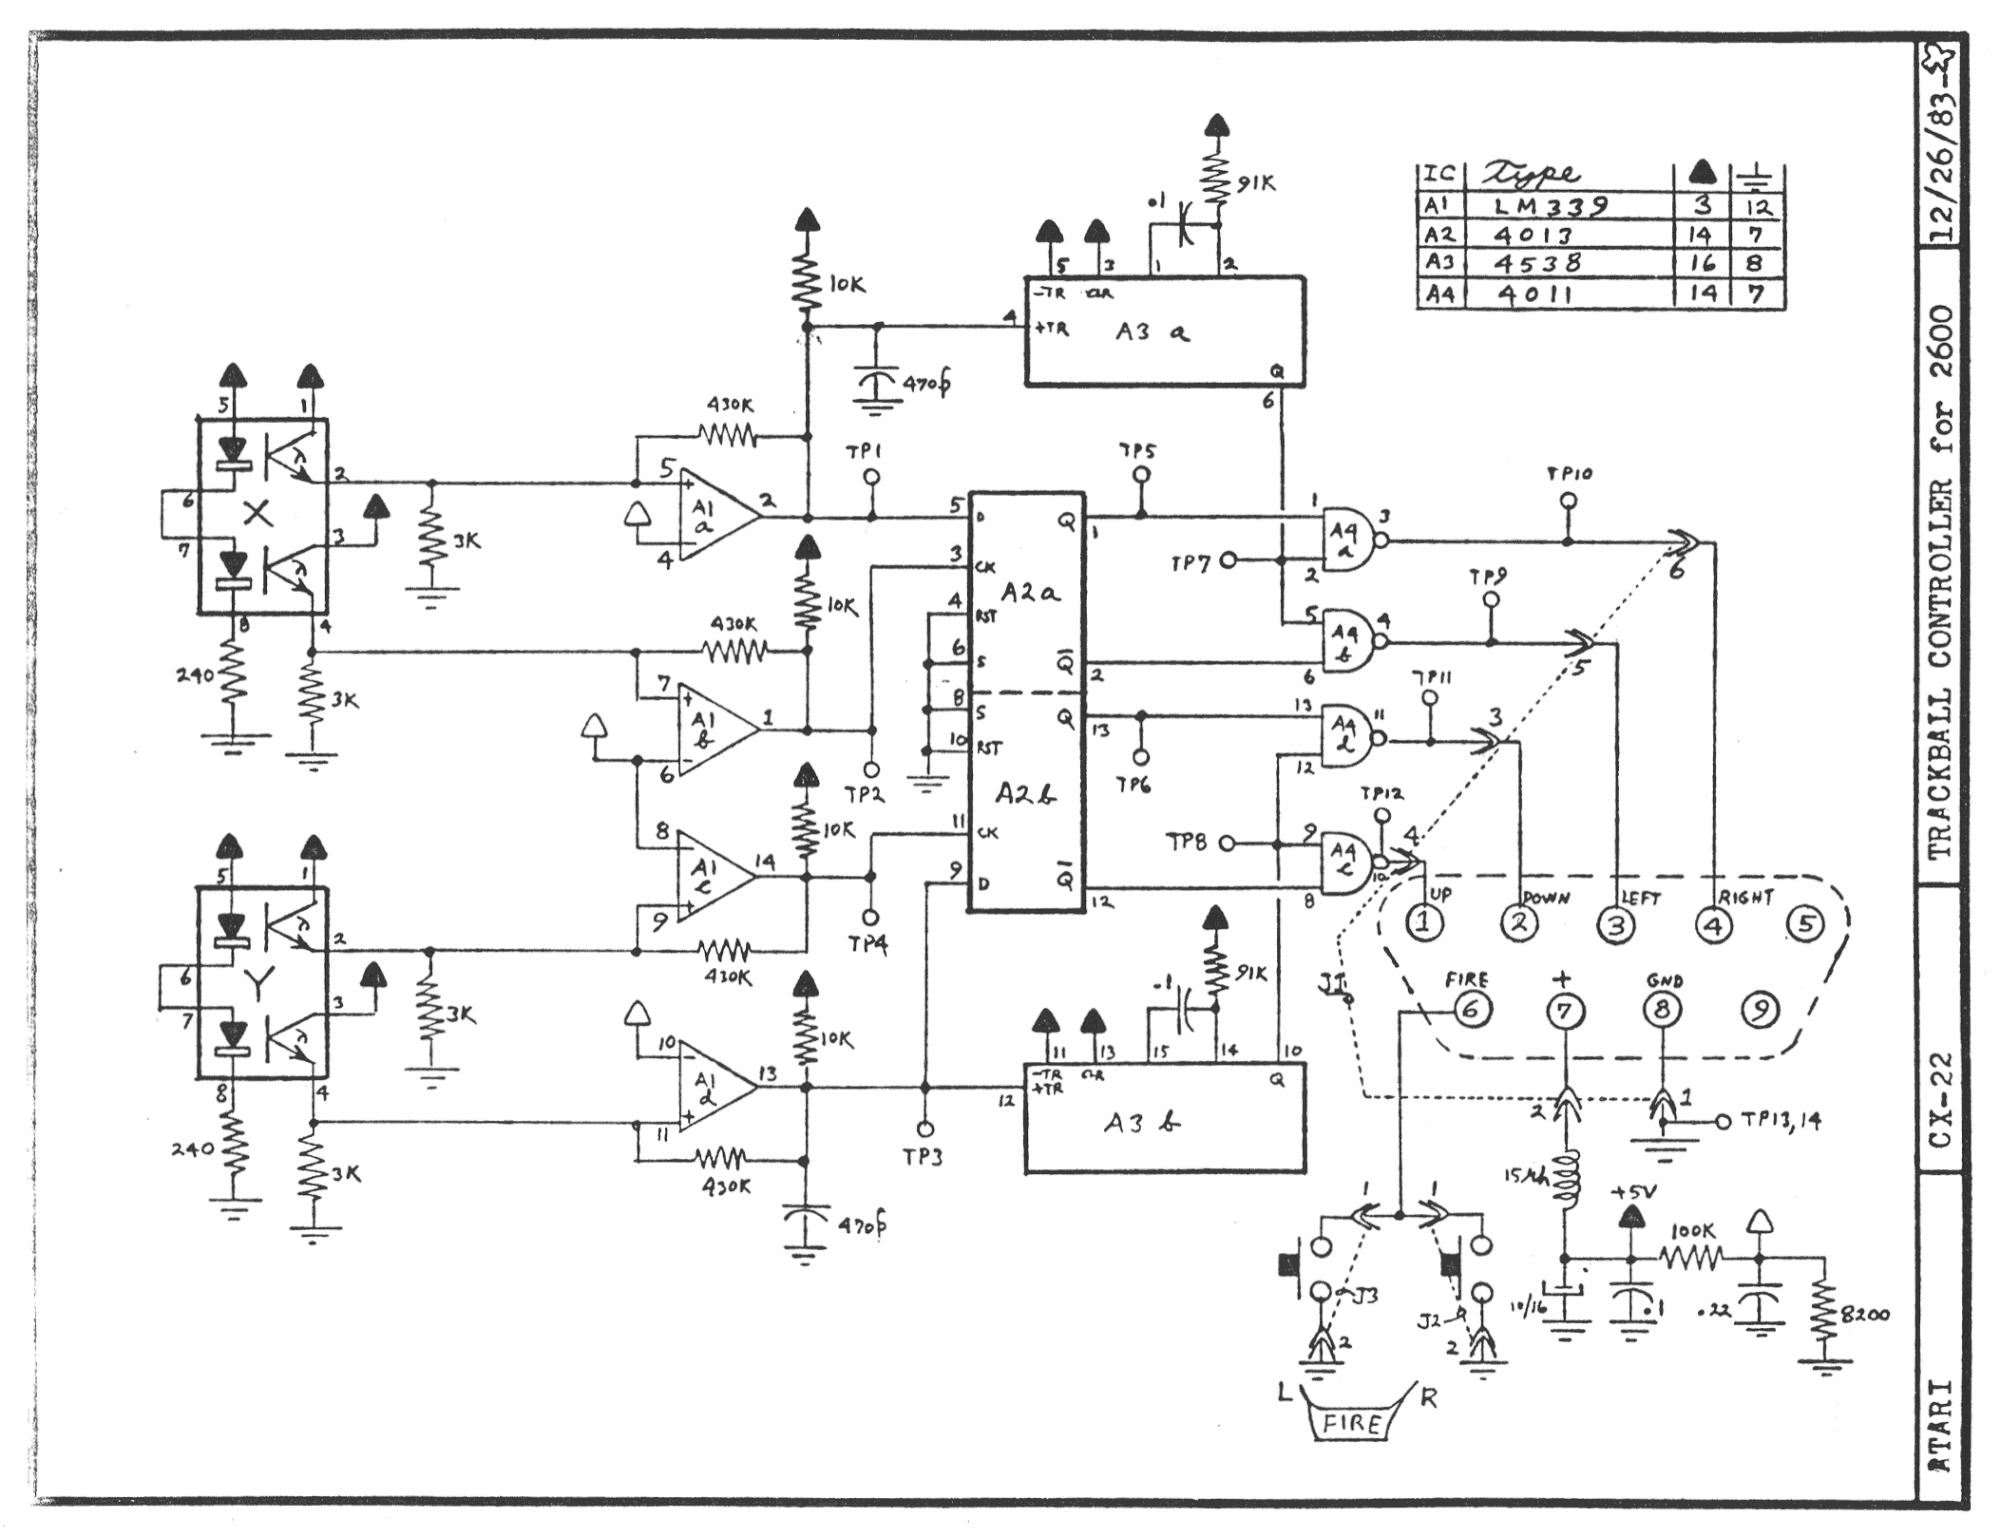 atariage - atari 2600 schematics